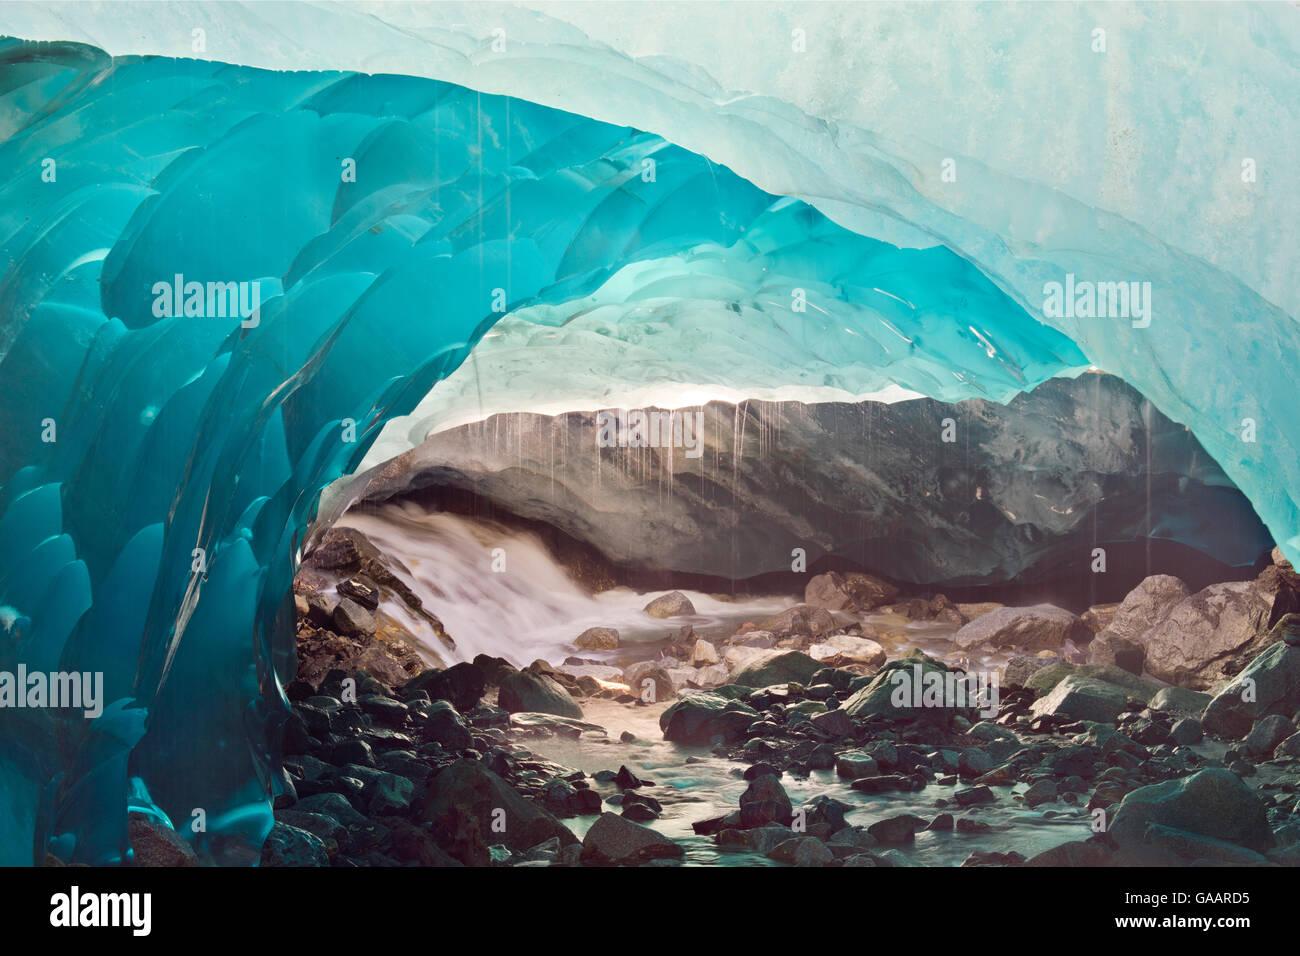 Ice cave melting in Mendenhall Glacier, Juneau, Alaska, USA, August 2014. - Stock Image